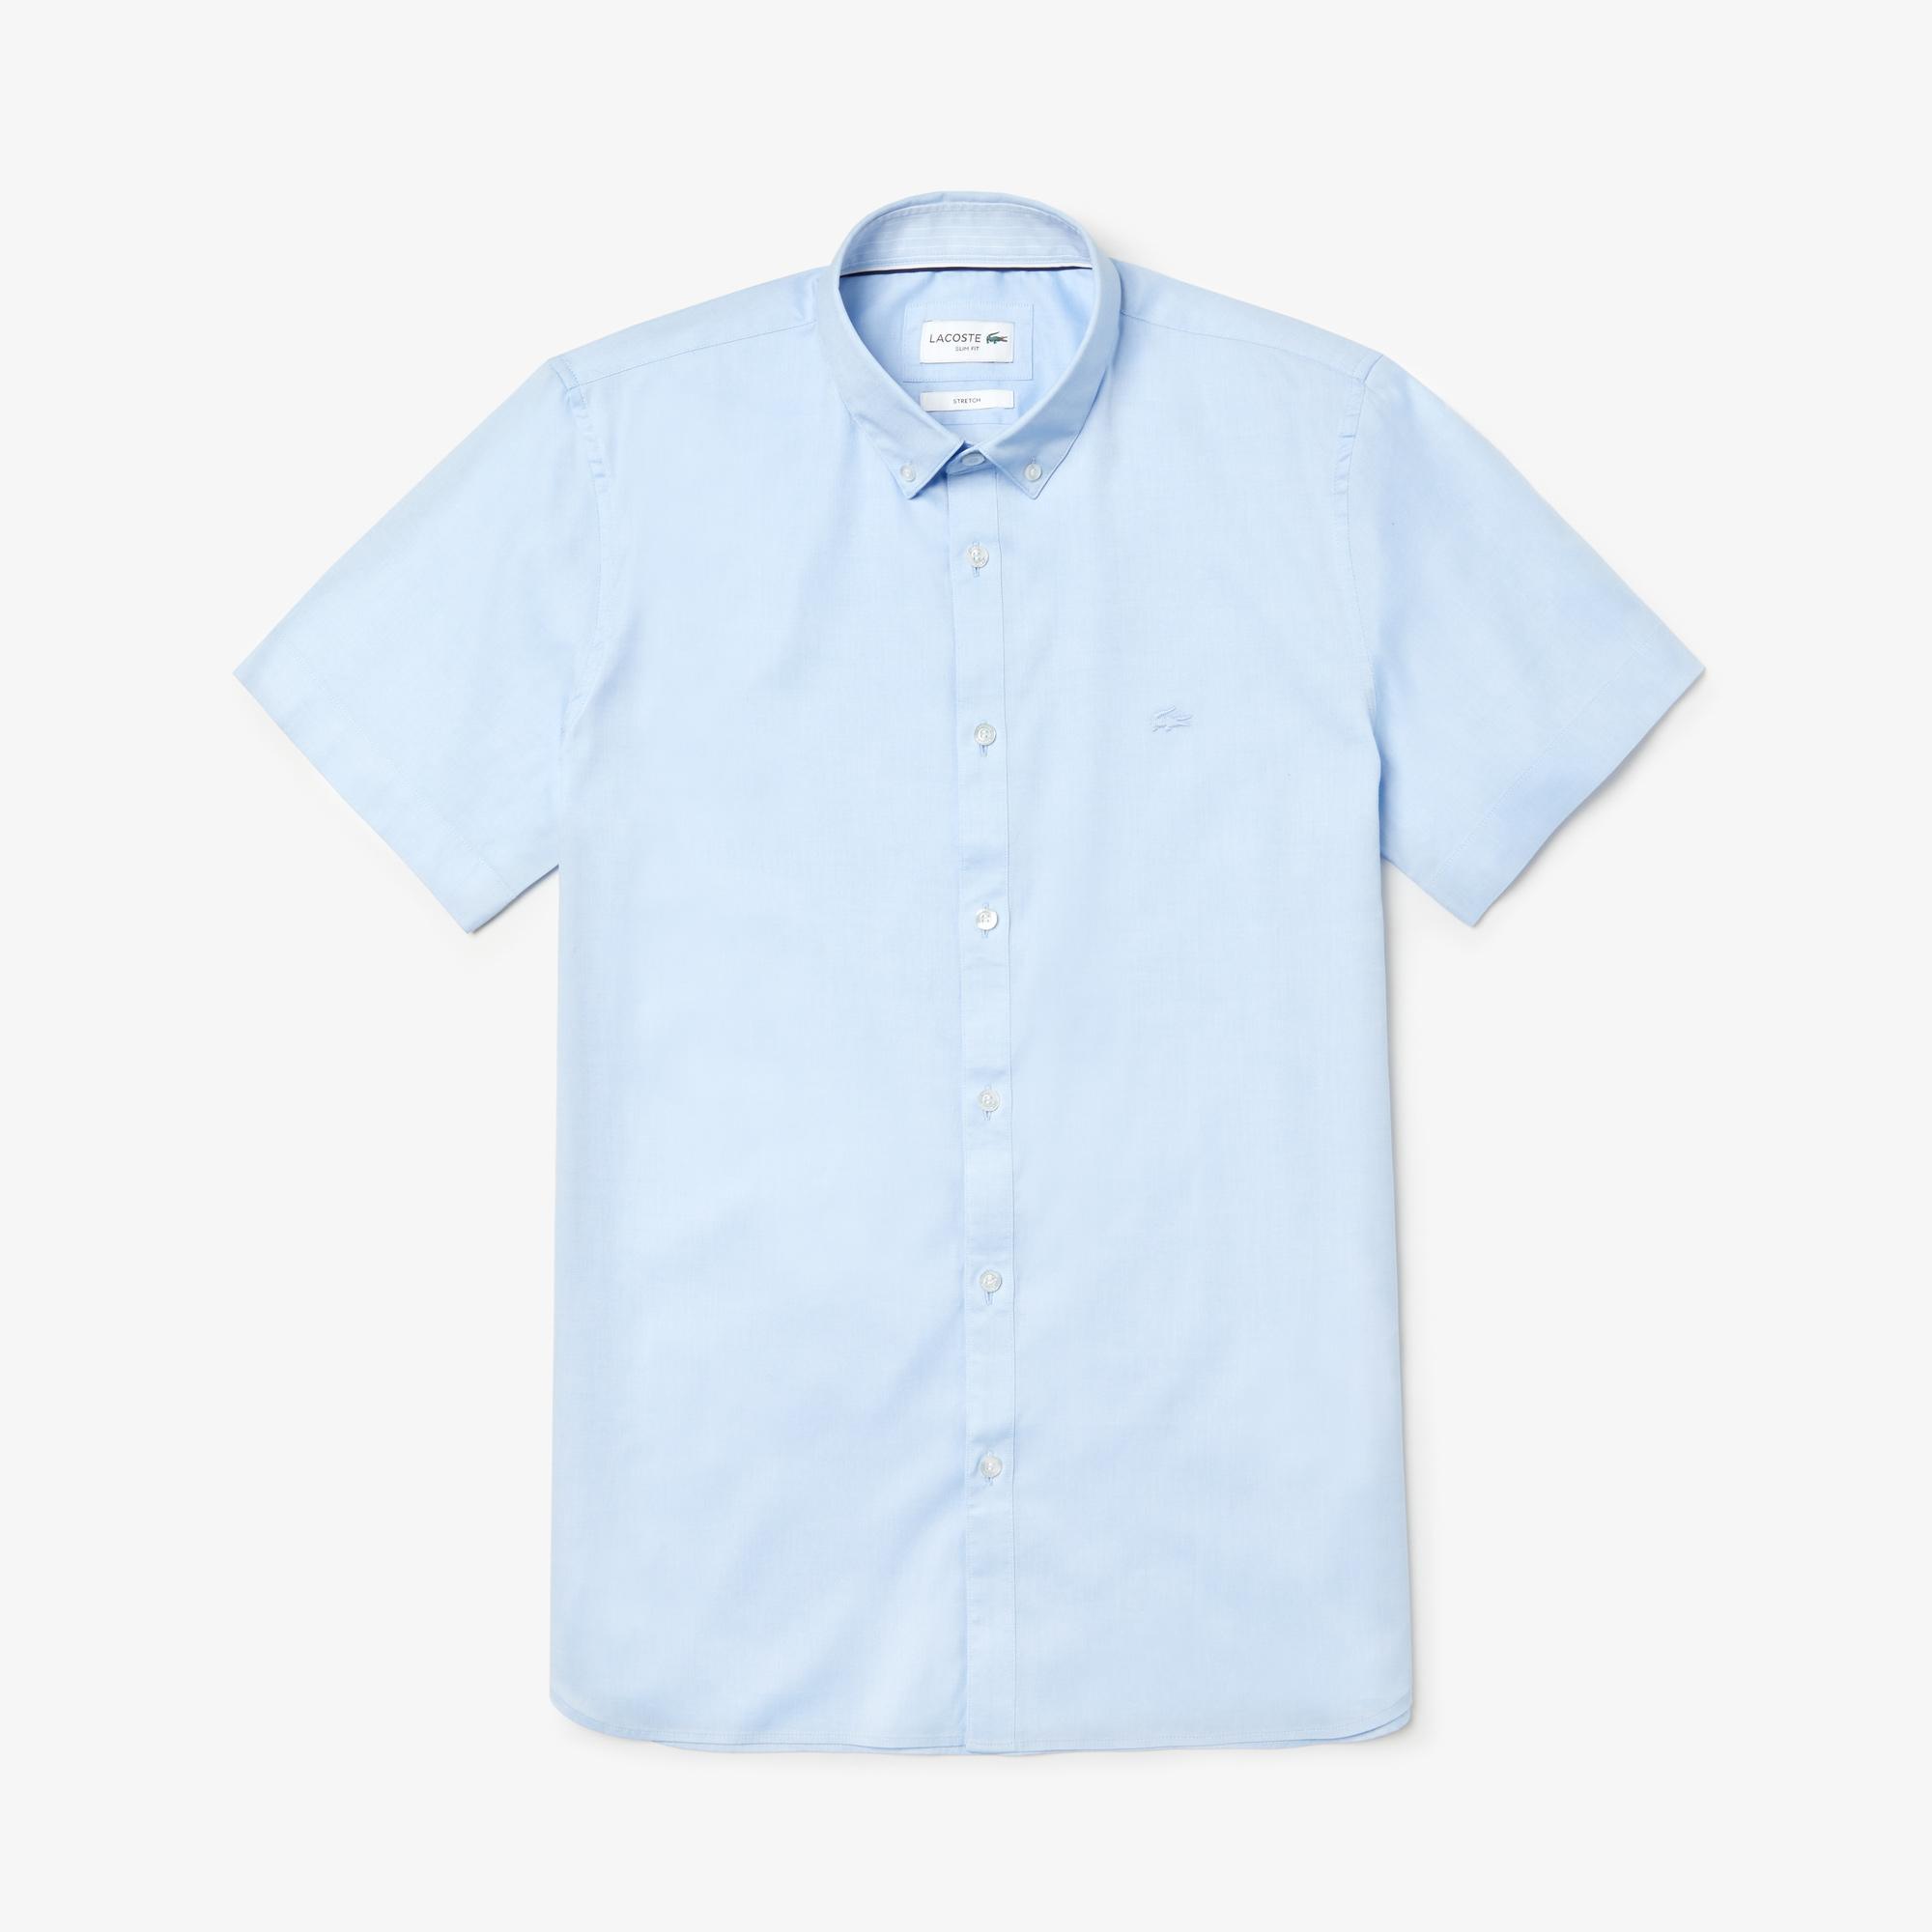 Lacoste Men's Short Sleeve Wovens Shirt